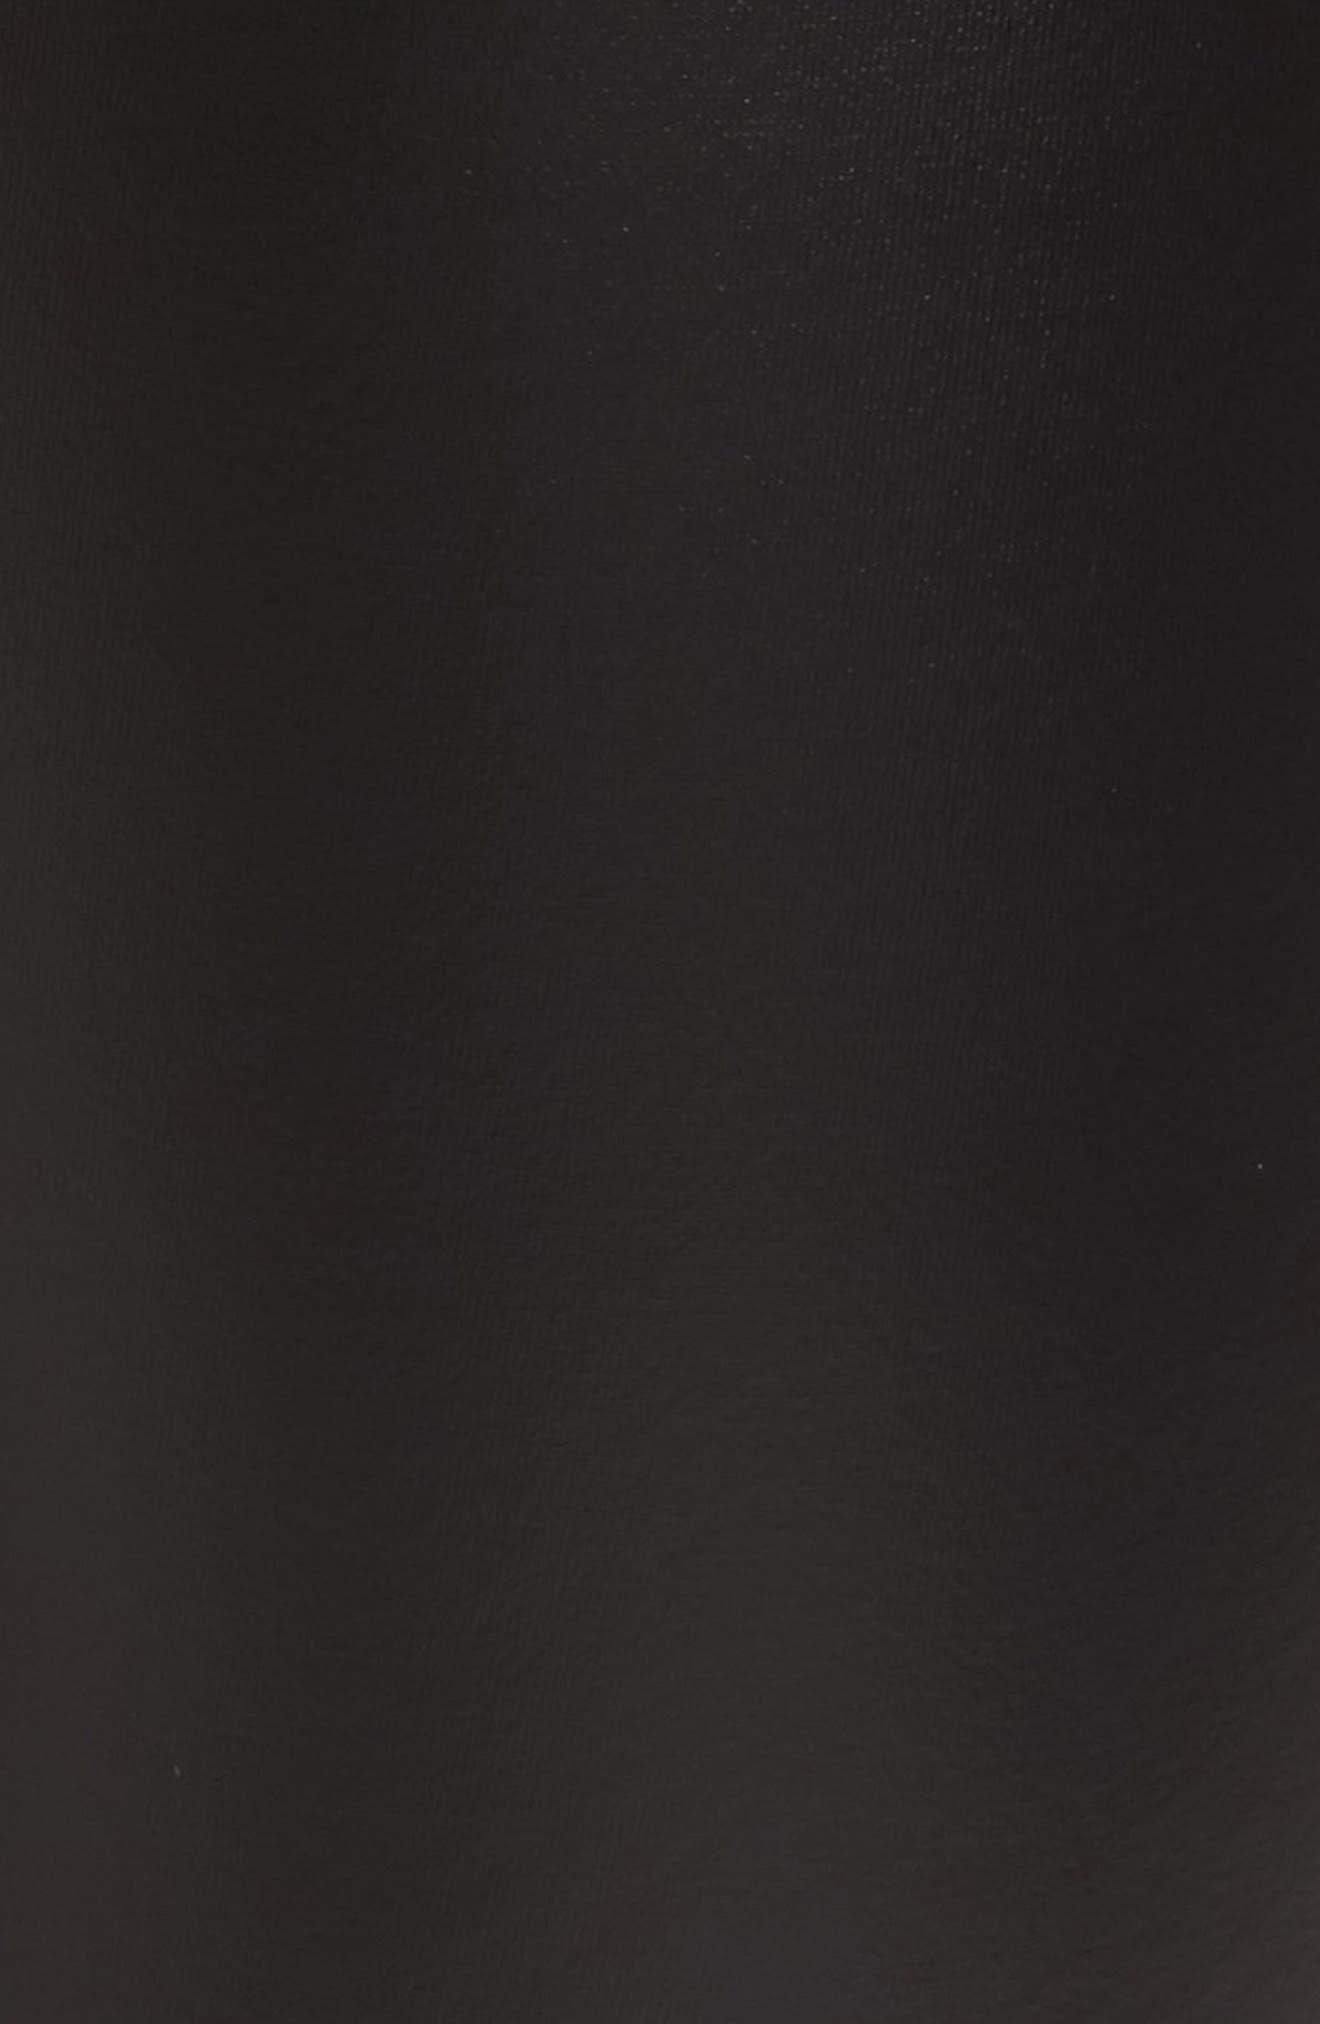 Plush Lined Faux Leather Leggings,                             Alternate thumbnail 5, color,                             001